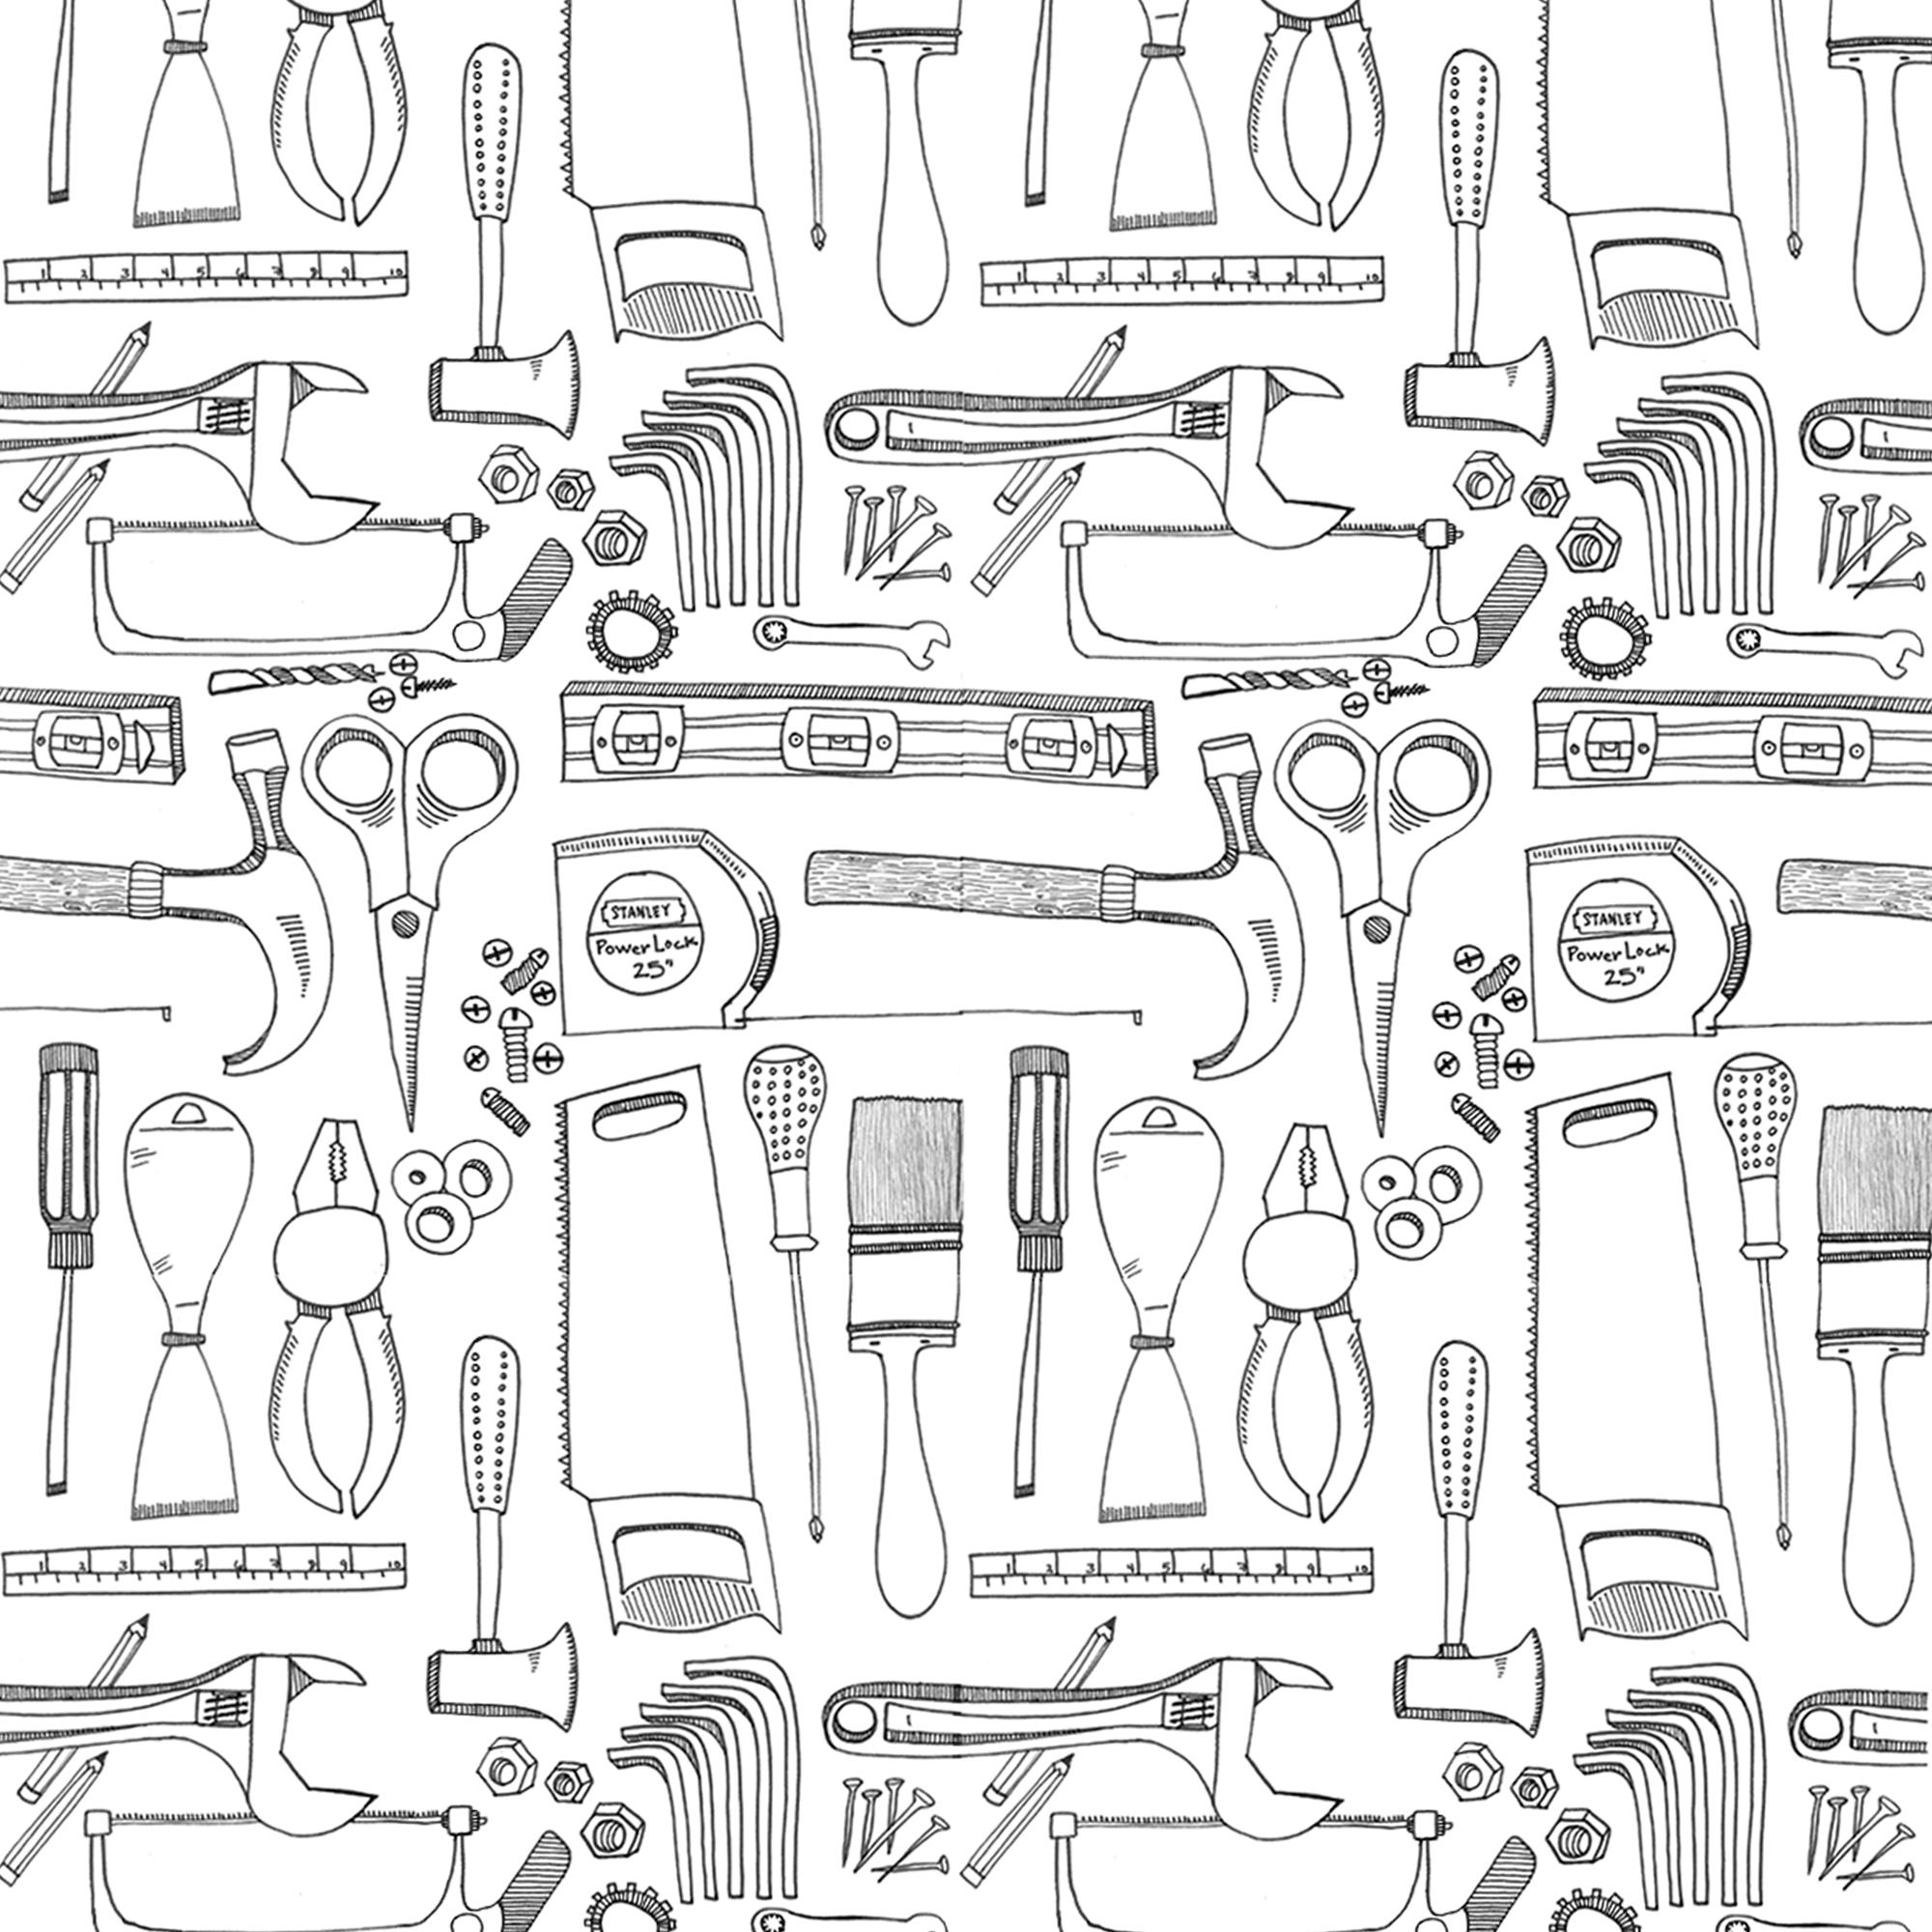 HandymanToolbox_2.jpg